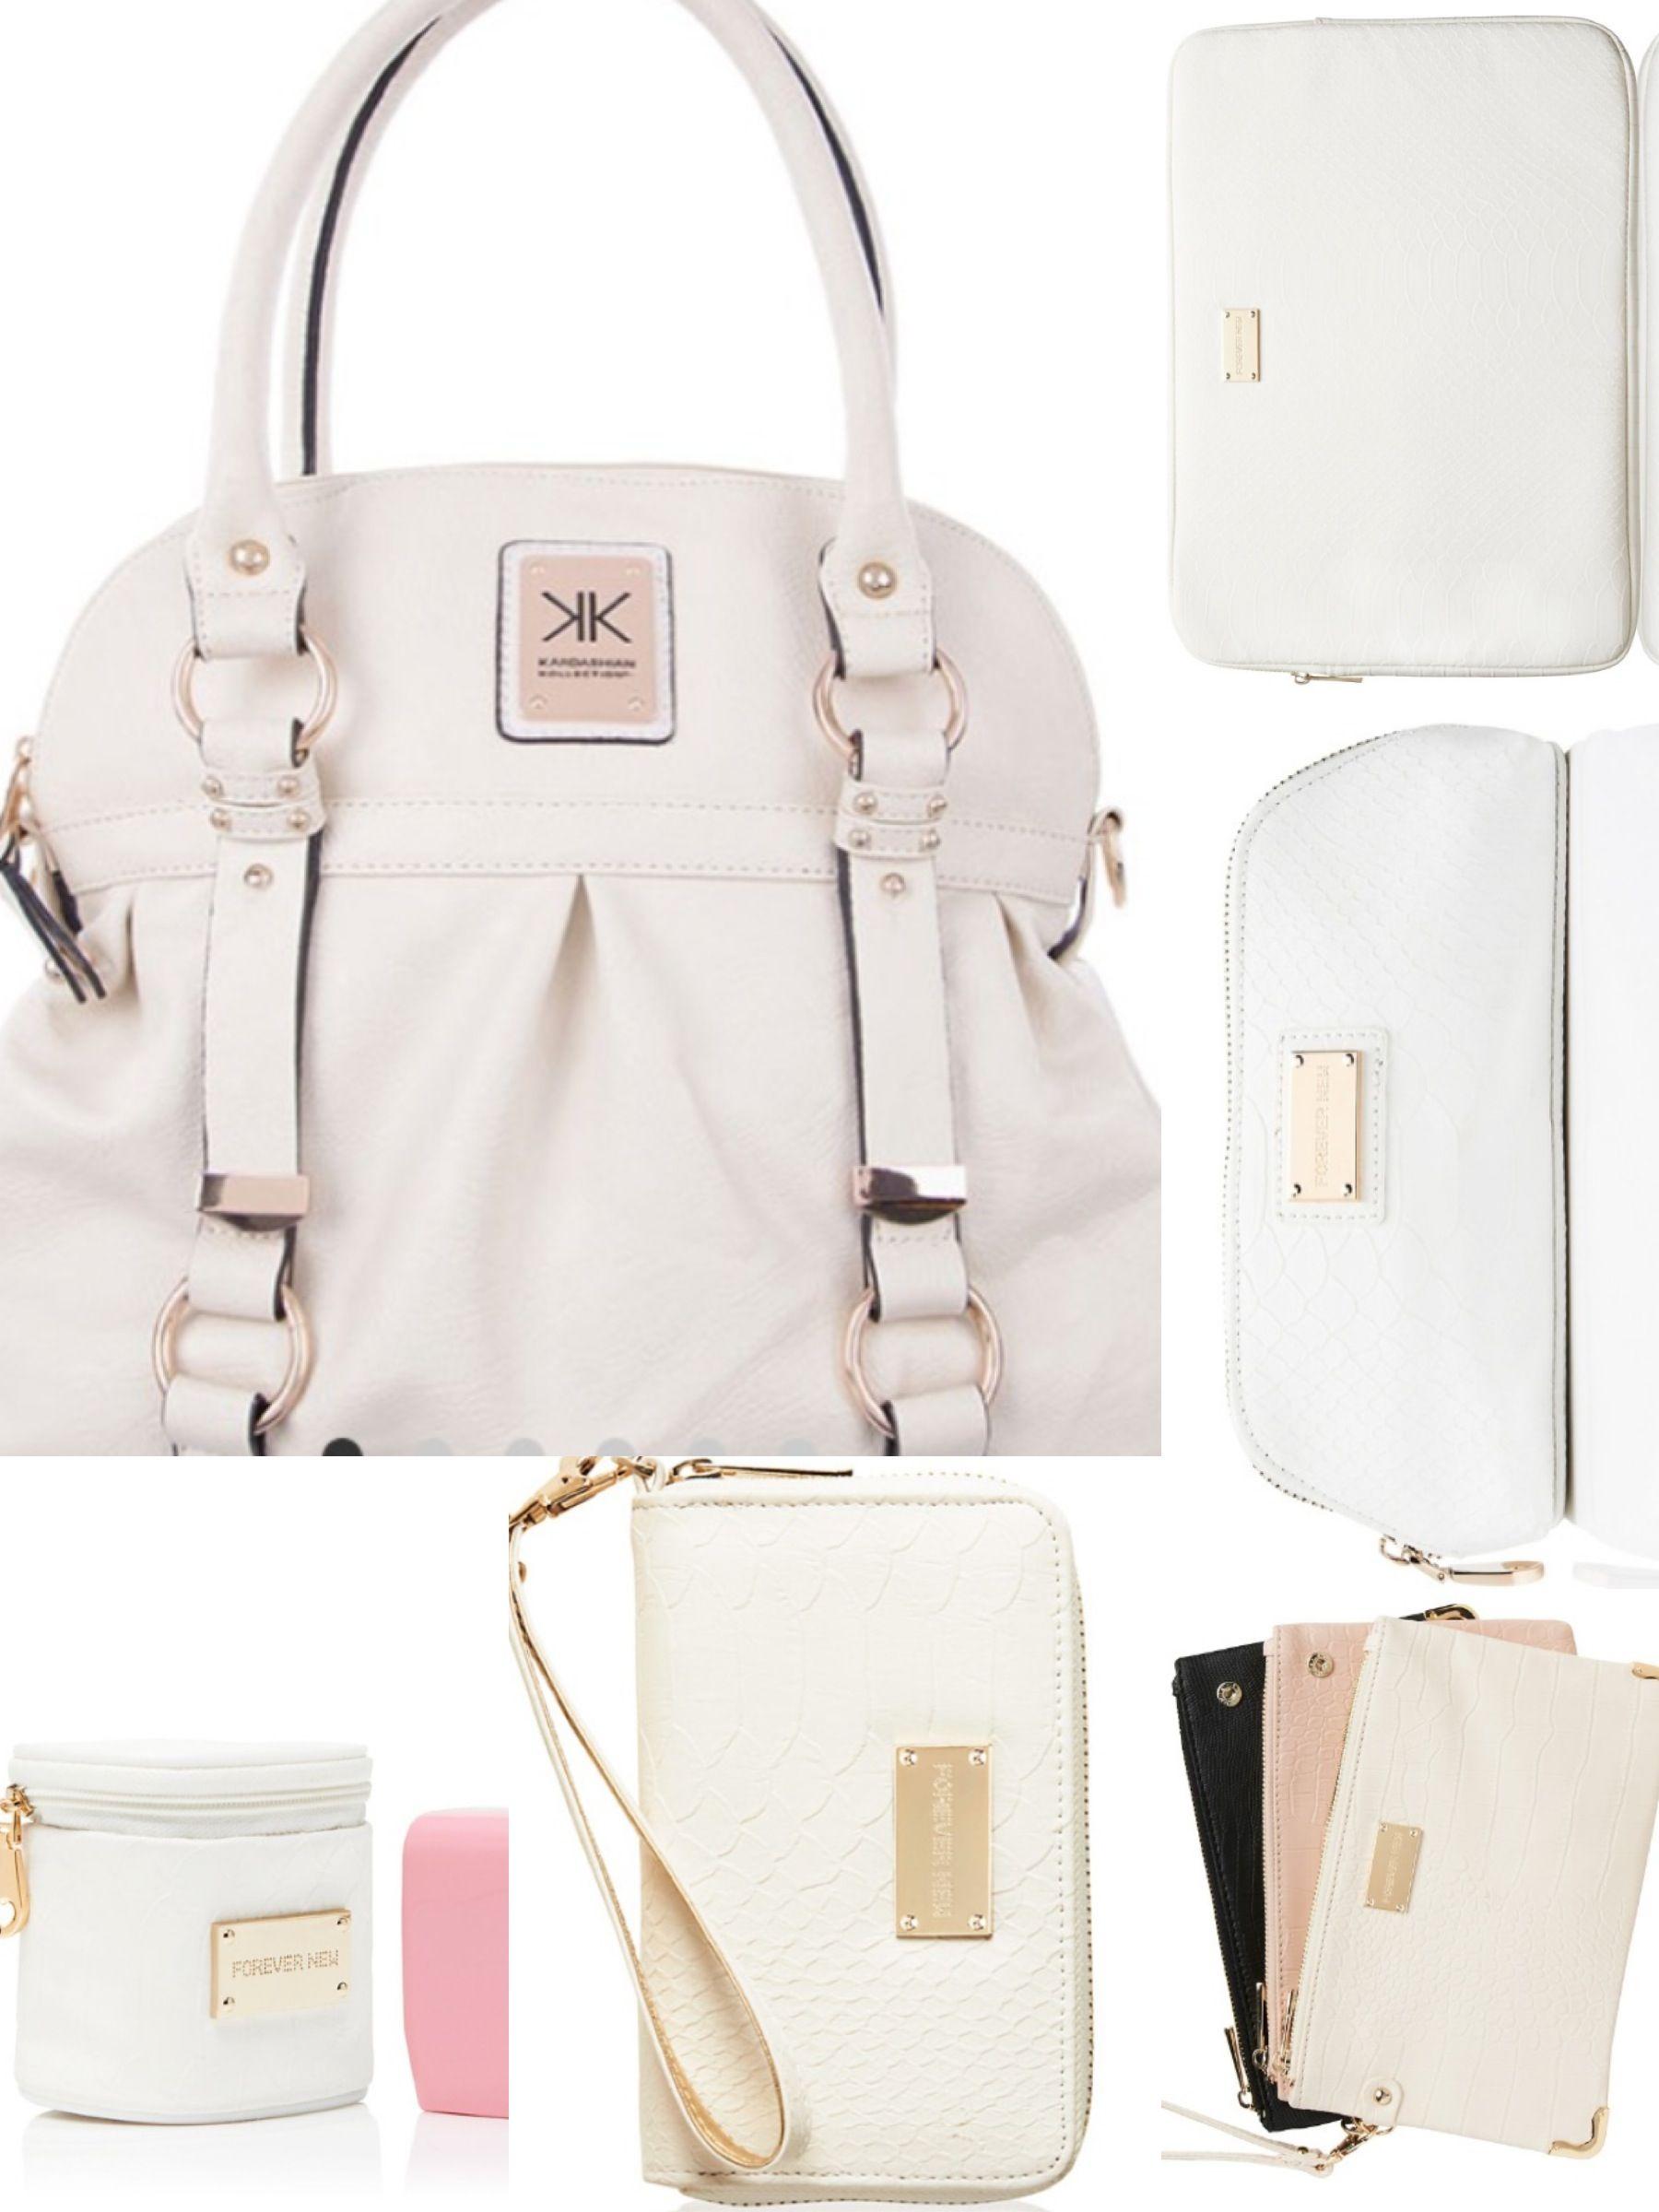 New handbag set! Kardashian Kollection, white, cream, gold